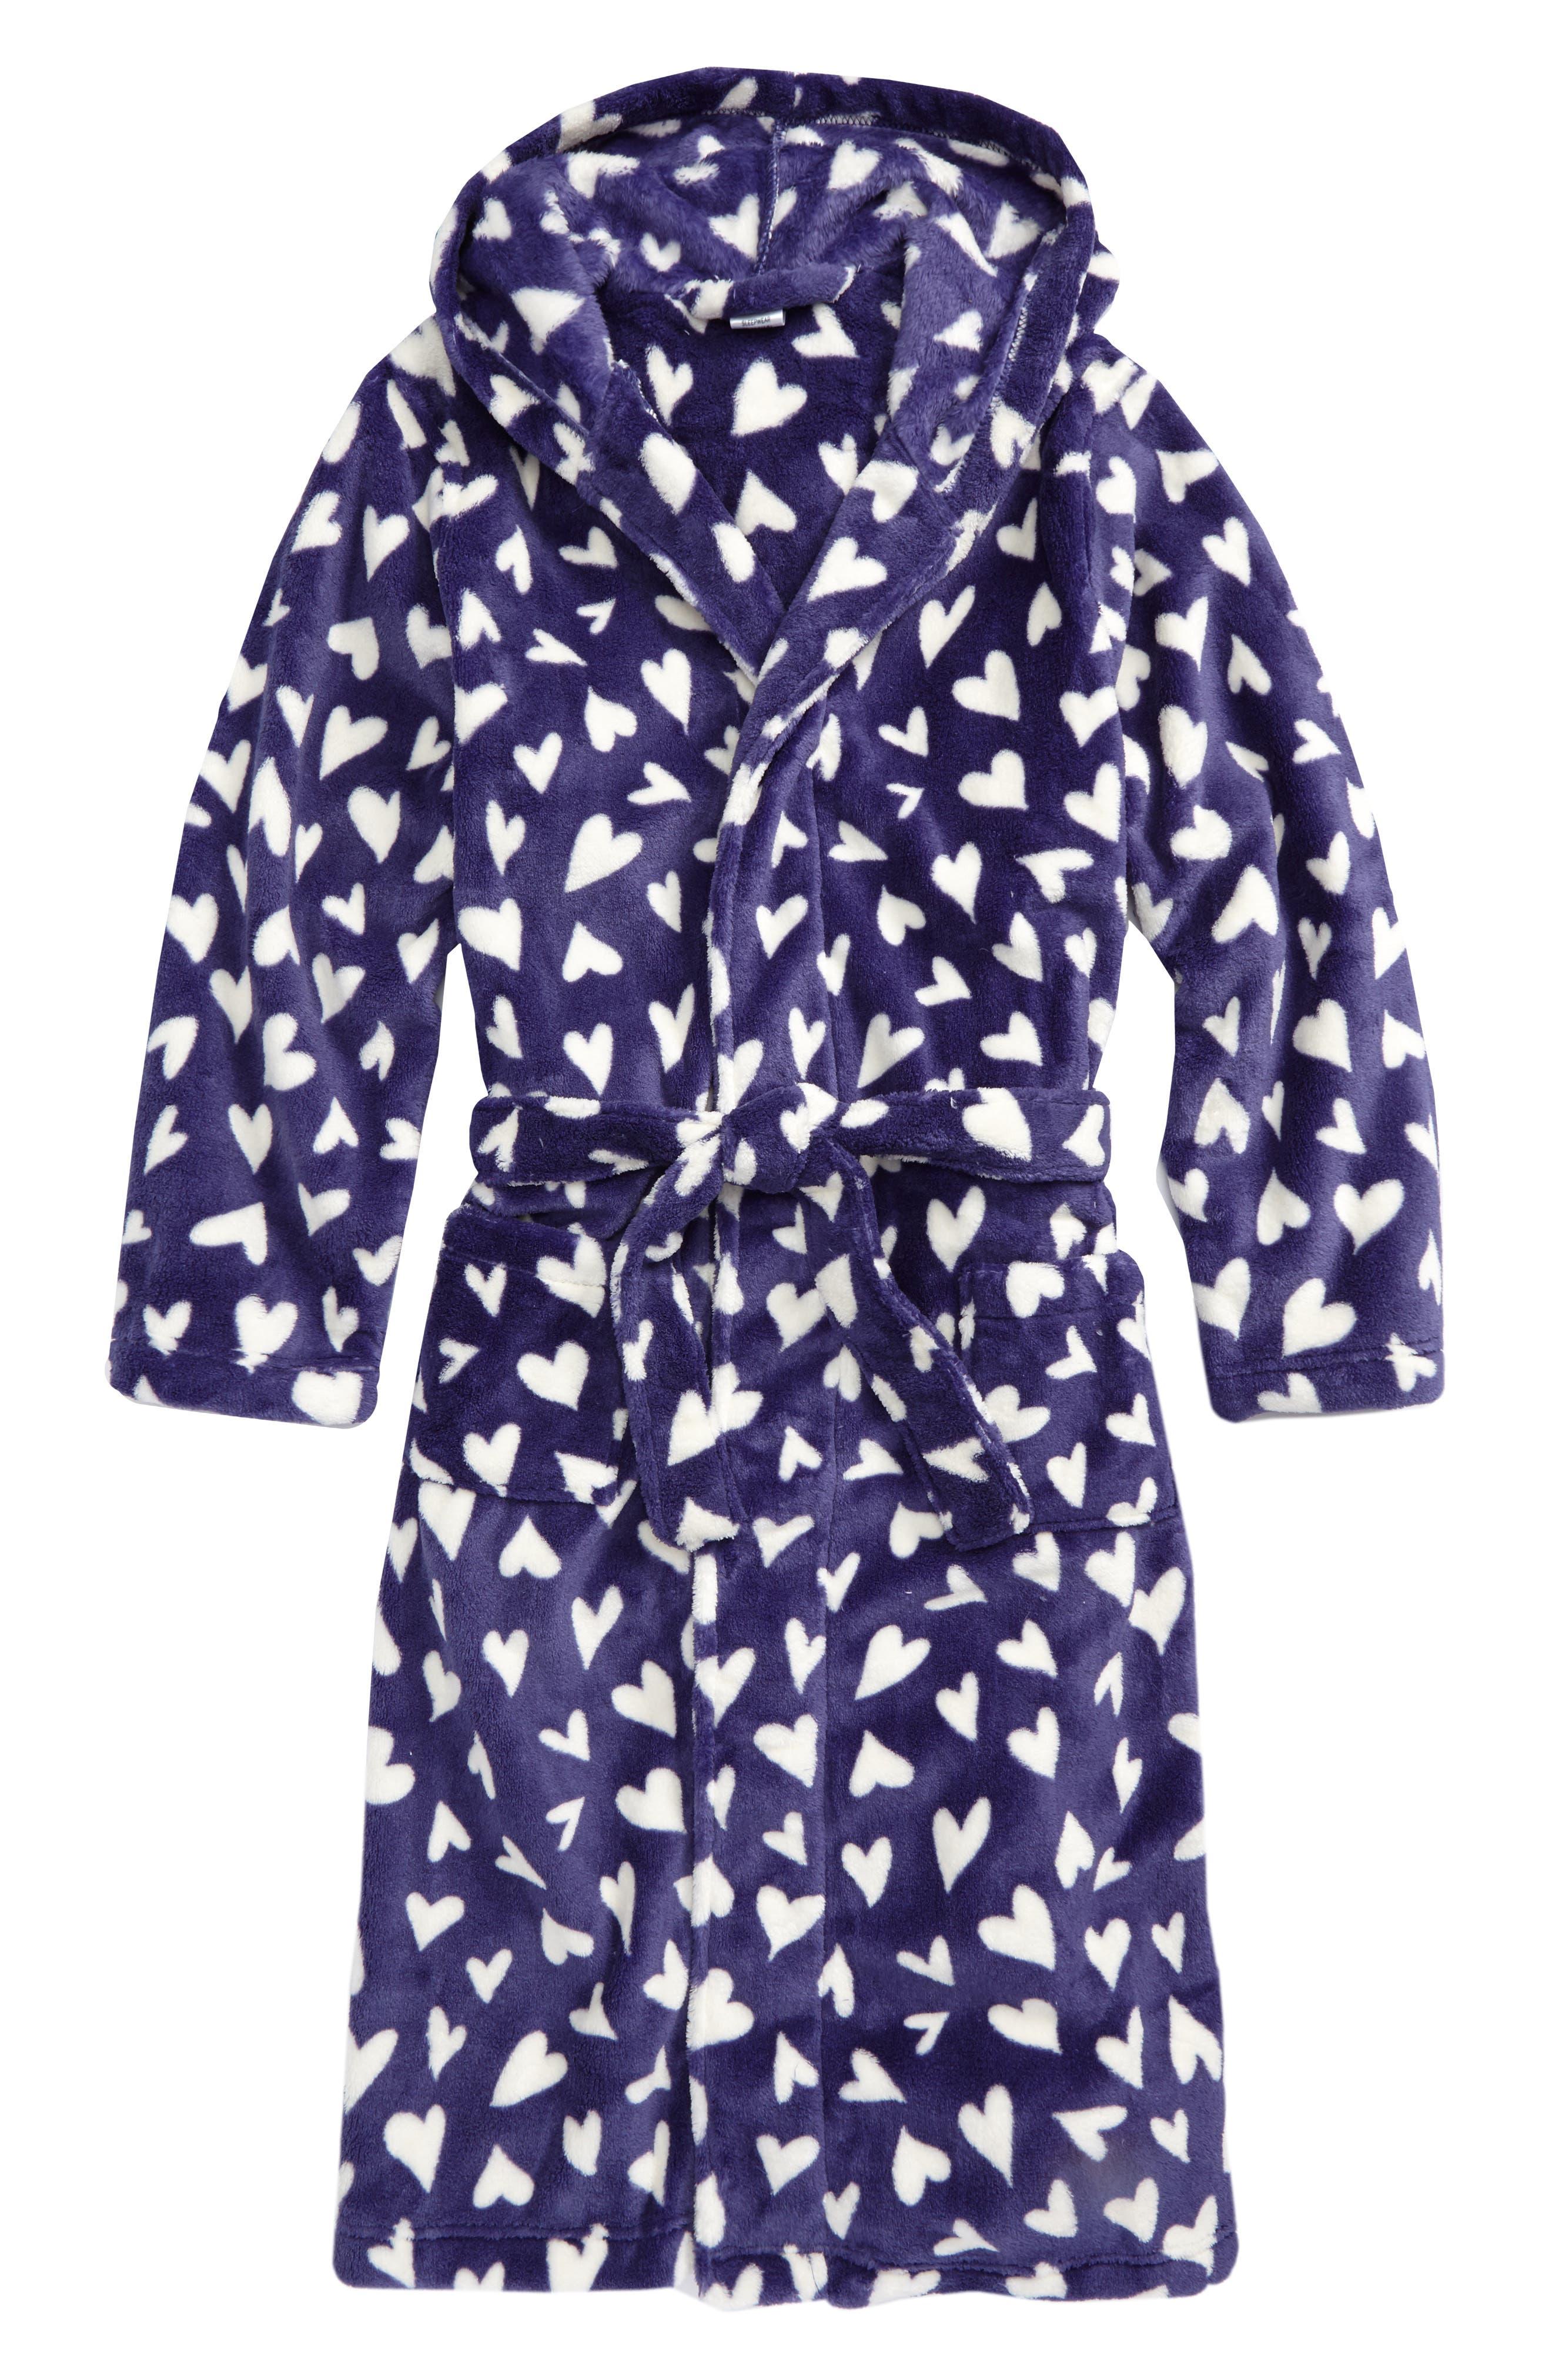 TUCKER + TATE Hooded Fleece Robe, Main, color, 410